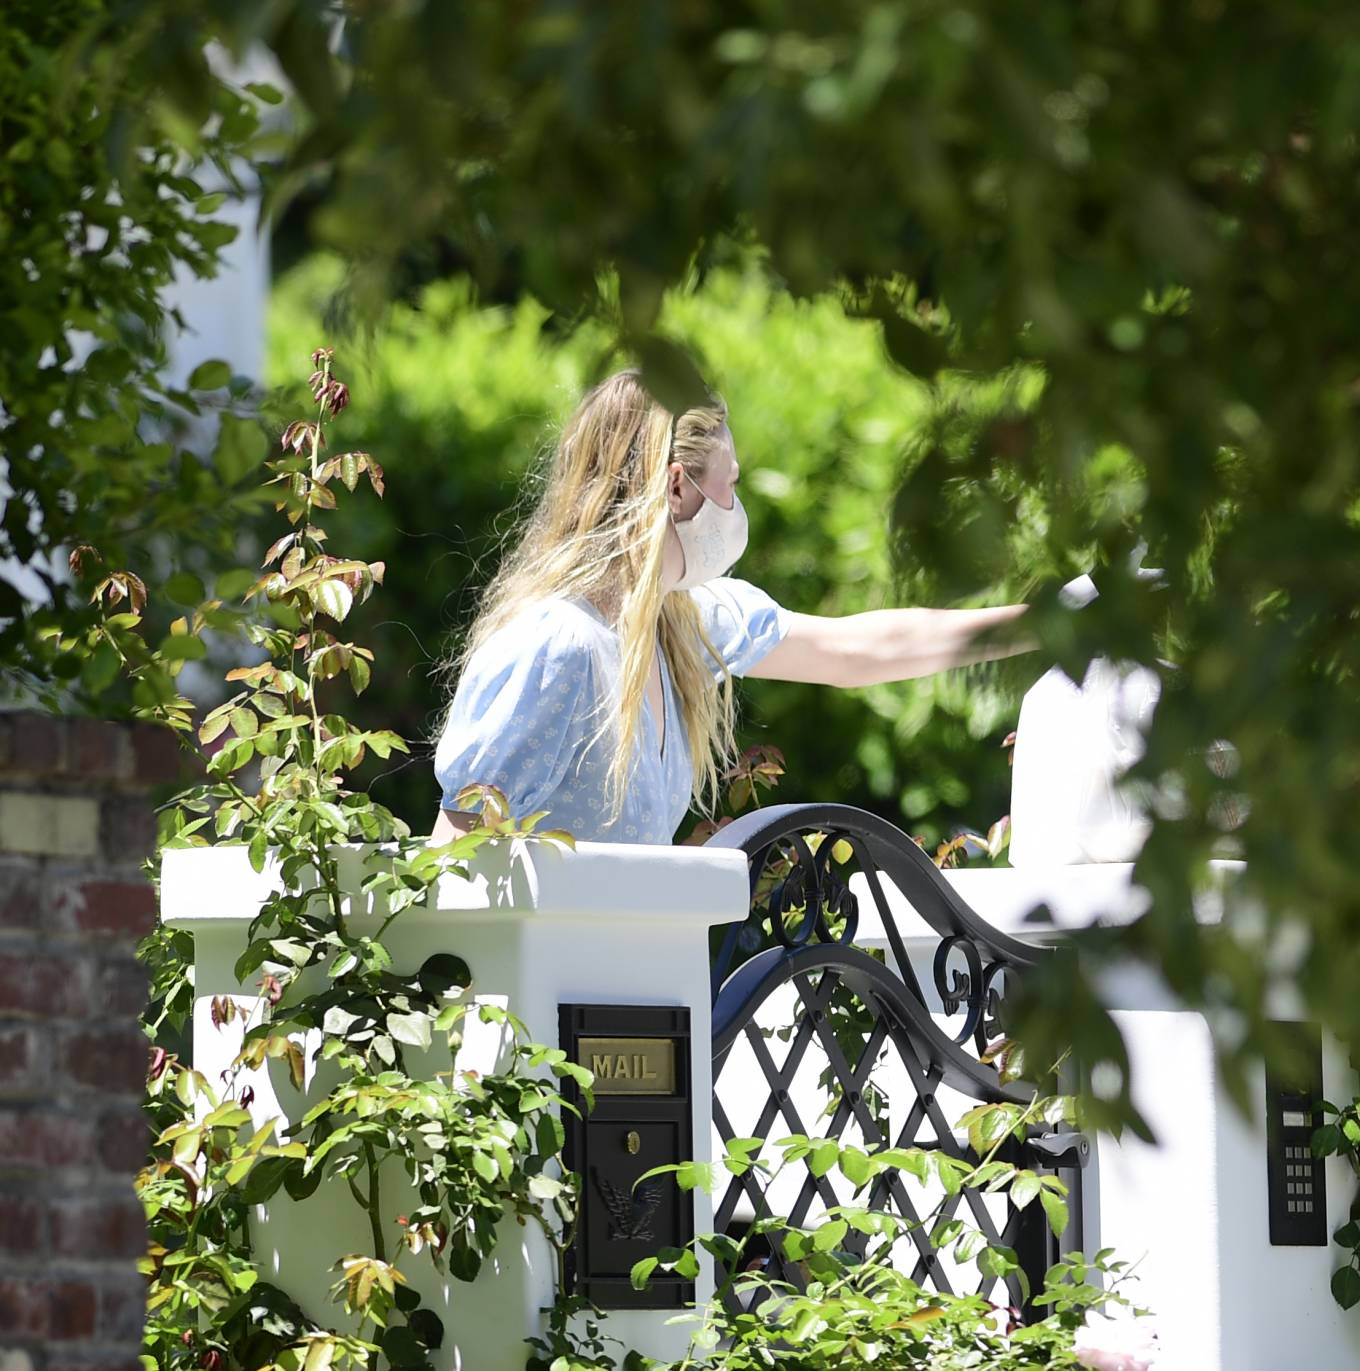 Dakota Fanning - Got food delivery in Los Angeles